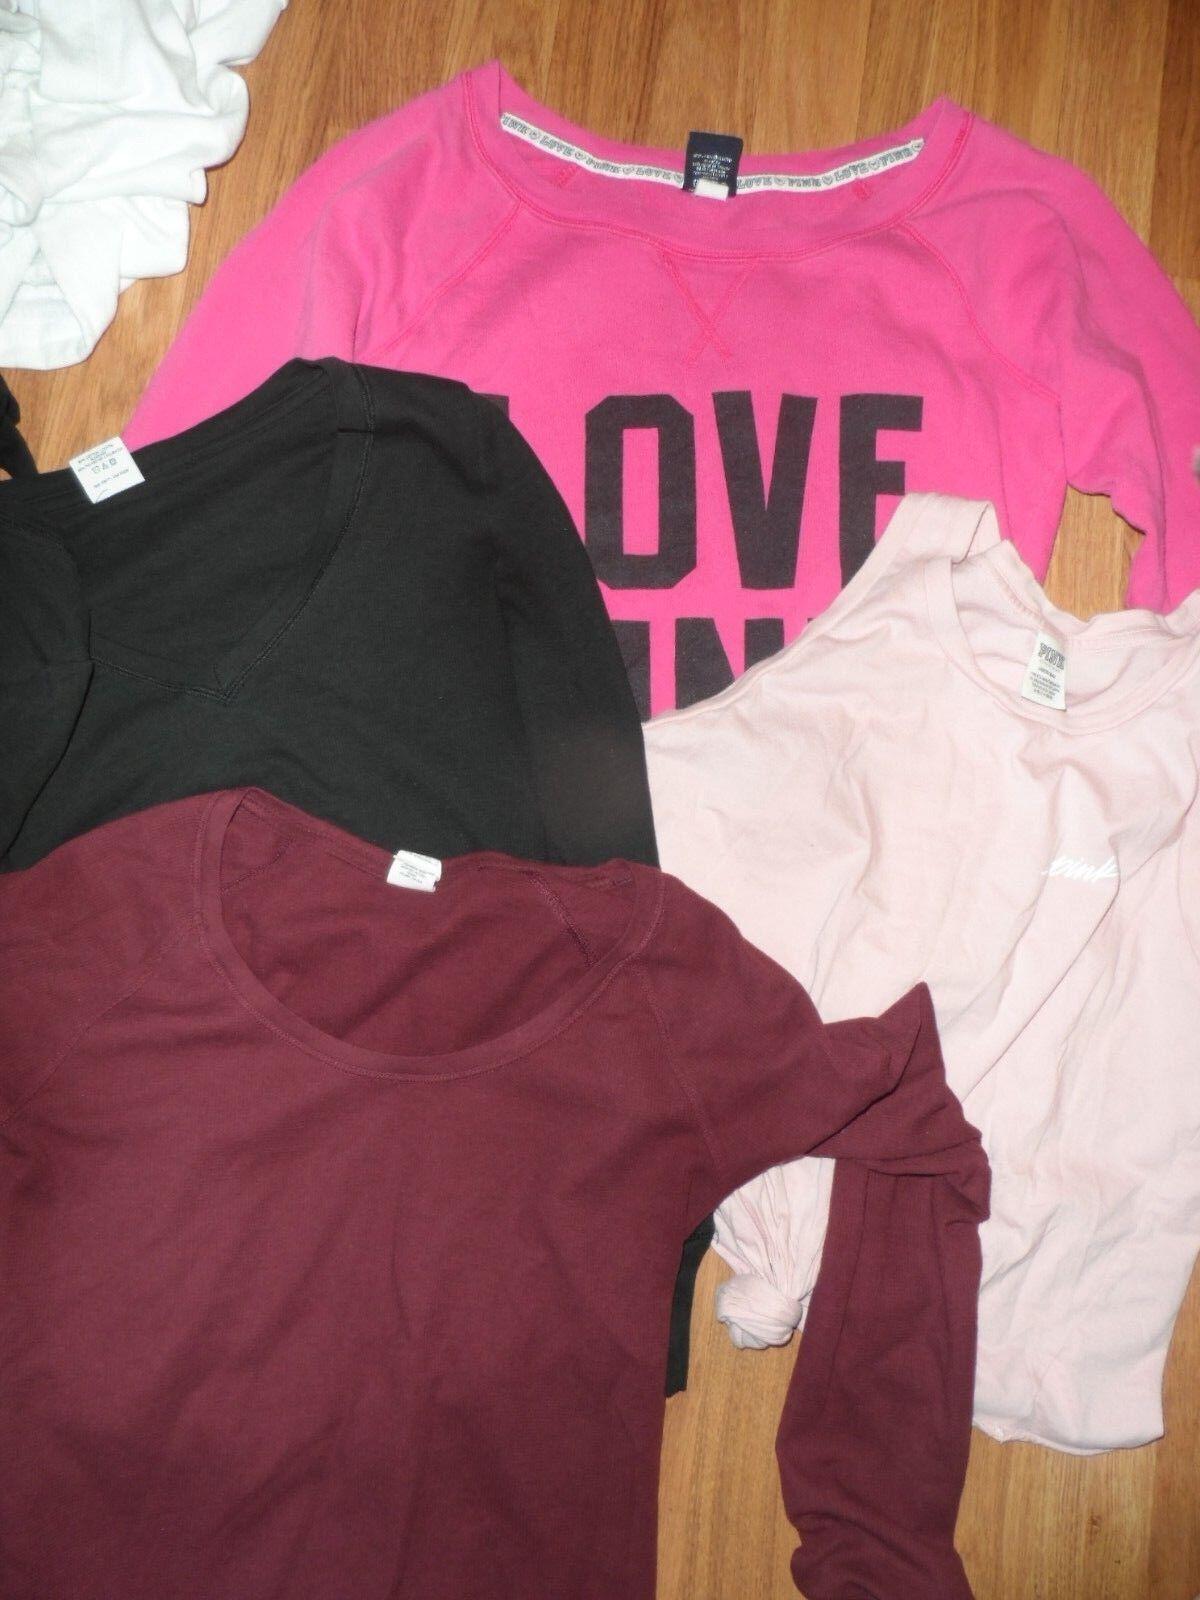 81ea9b5fb0a VS Victoria s secret PINK large lot 4 top thermal shirts sweatshirt tank  nzzbmj1665-Hoodies   Sweatshirts